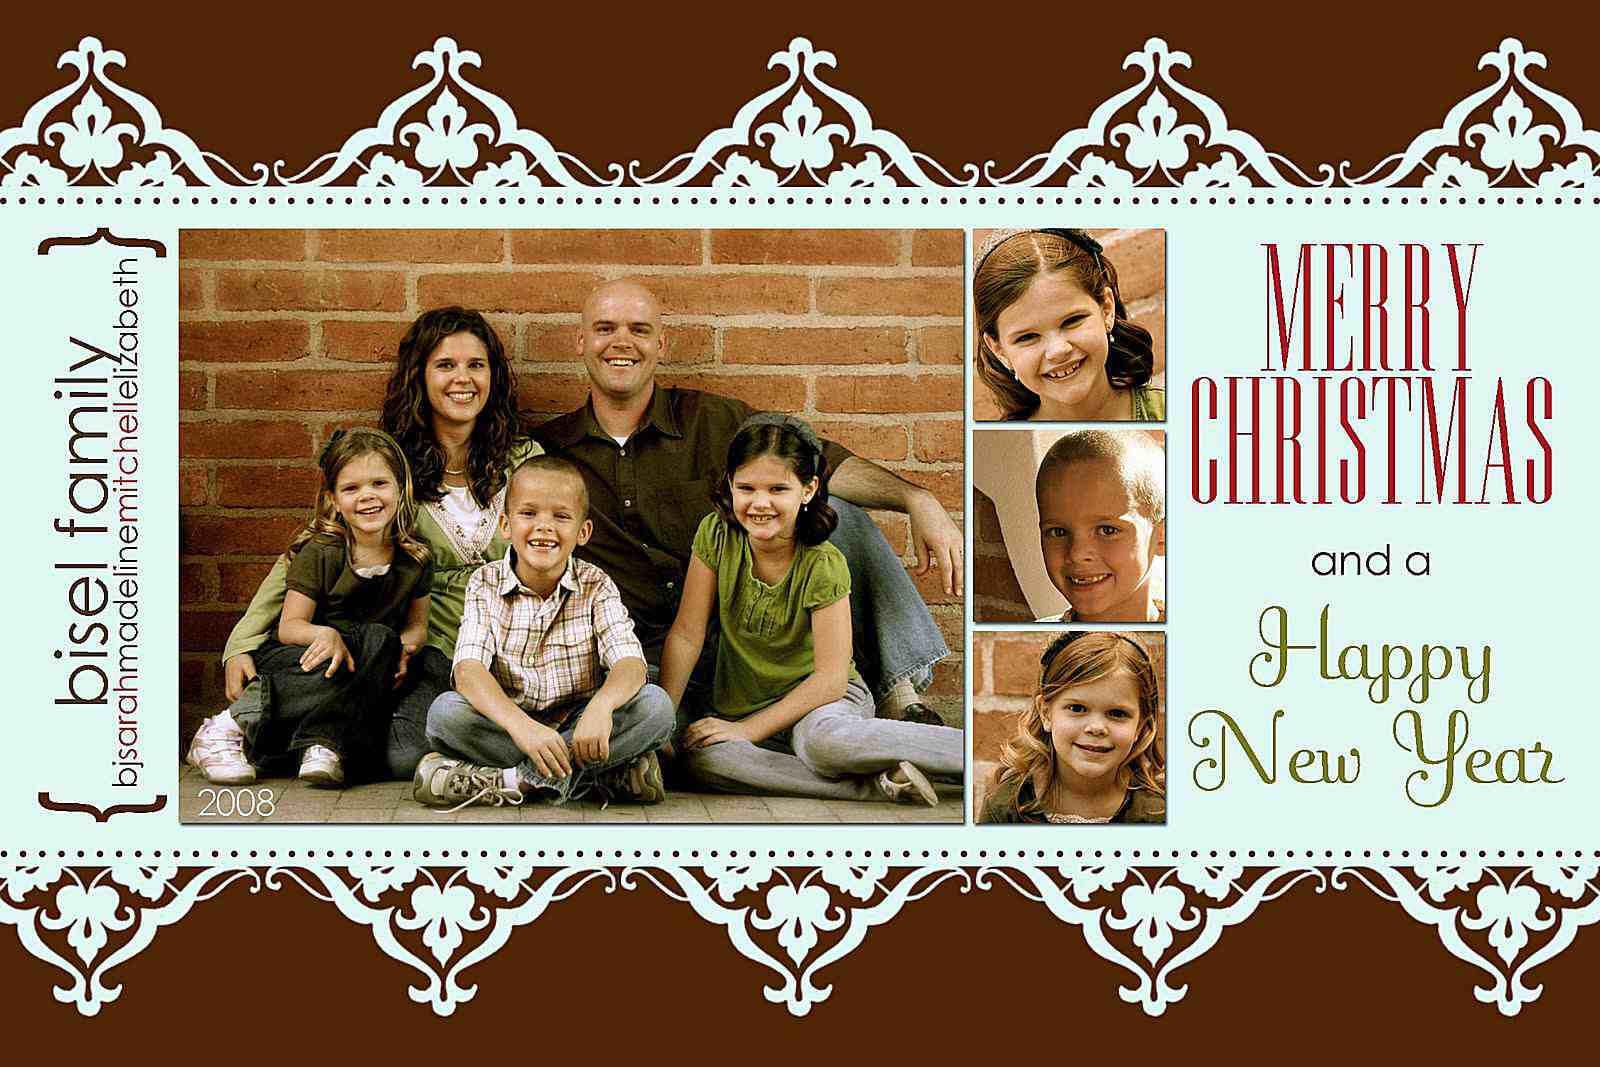 024 Milk And Honey Designs Free Christmas Card Templates For Free Christmas Card Templates For Photographers